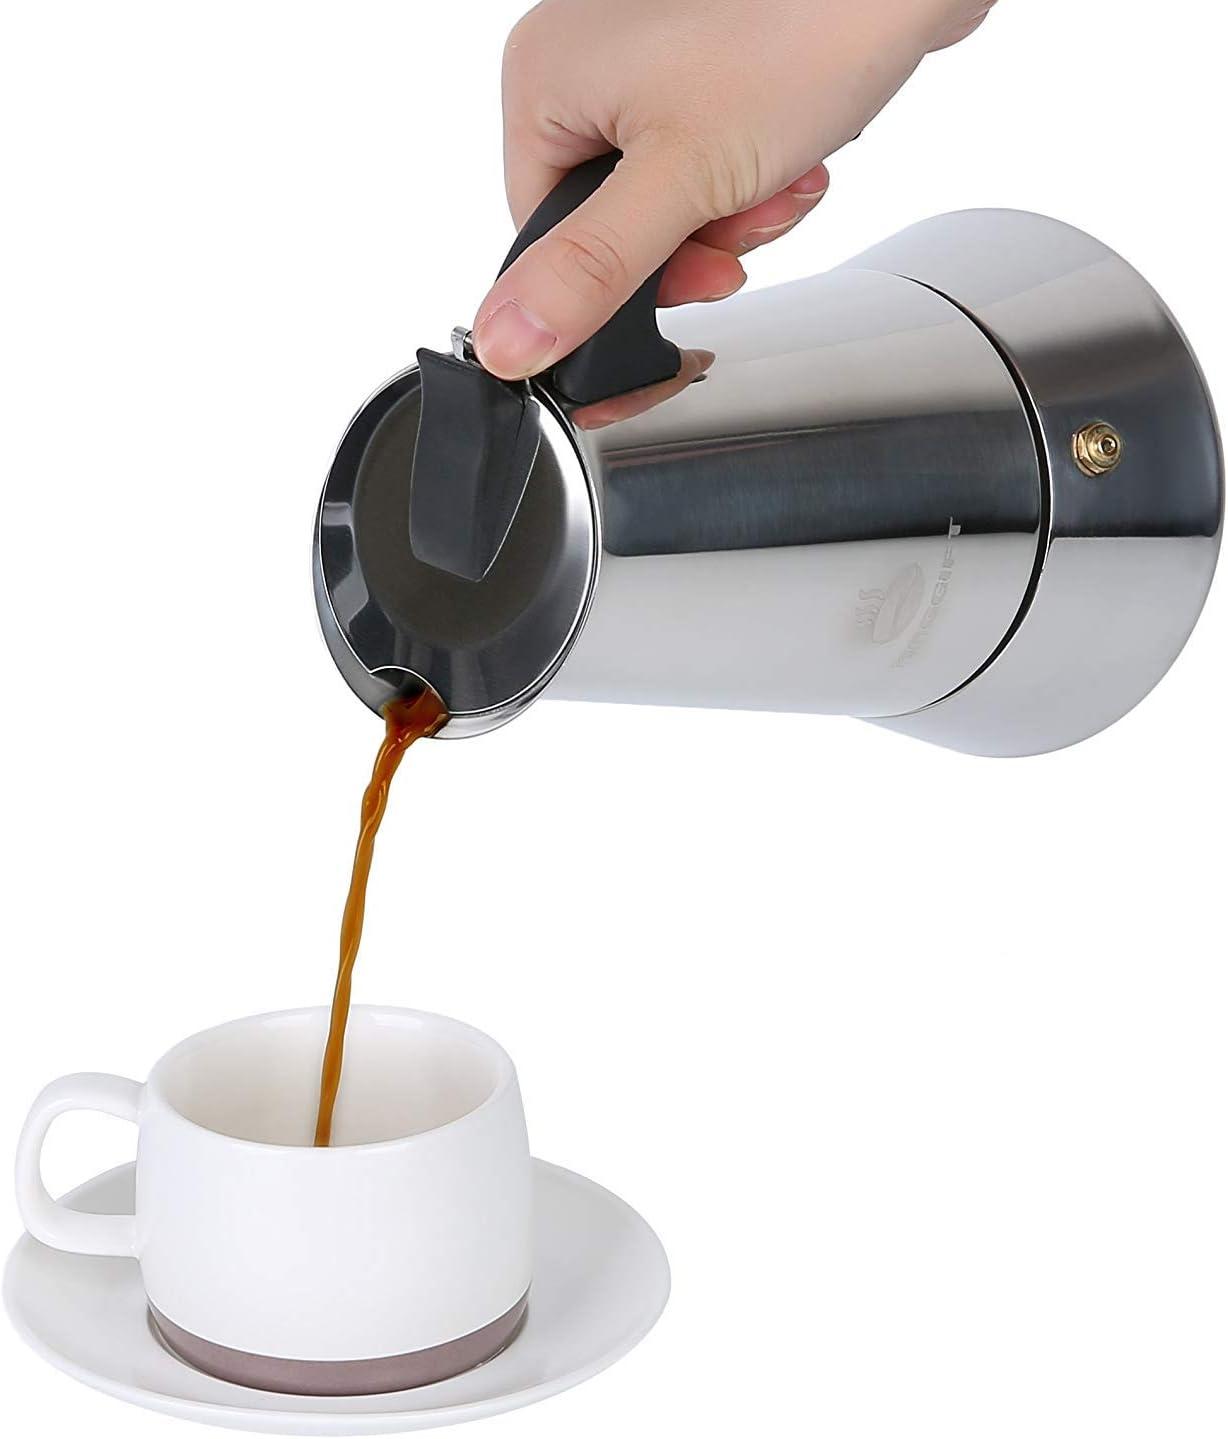 Amazon.com: Cafetera Greca Espresso Italiana Capuchino Moka ...